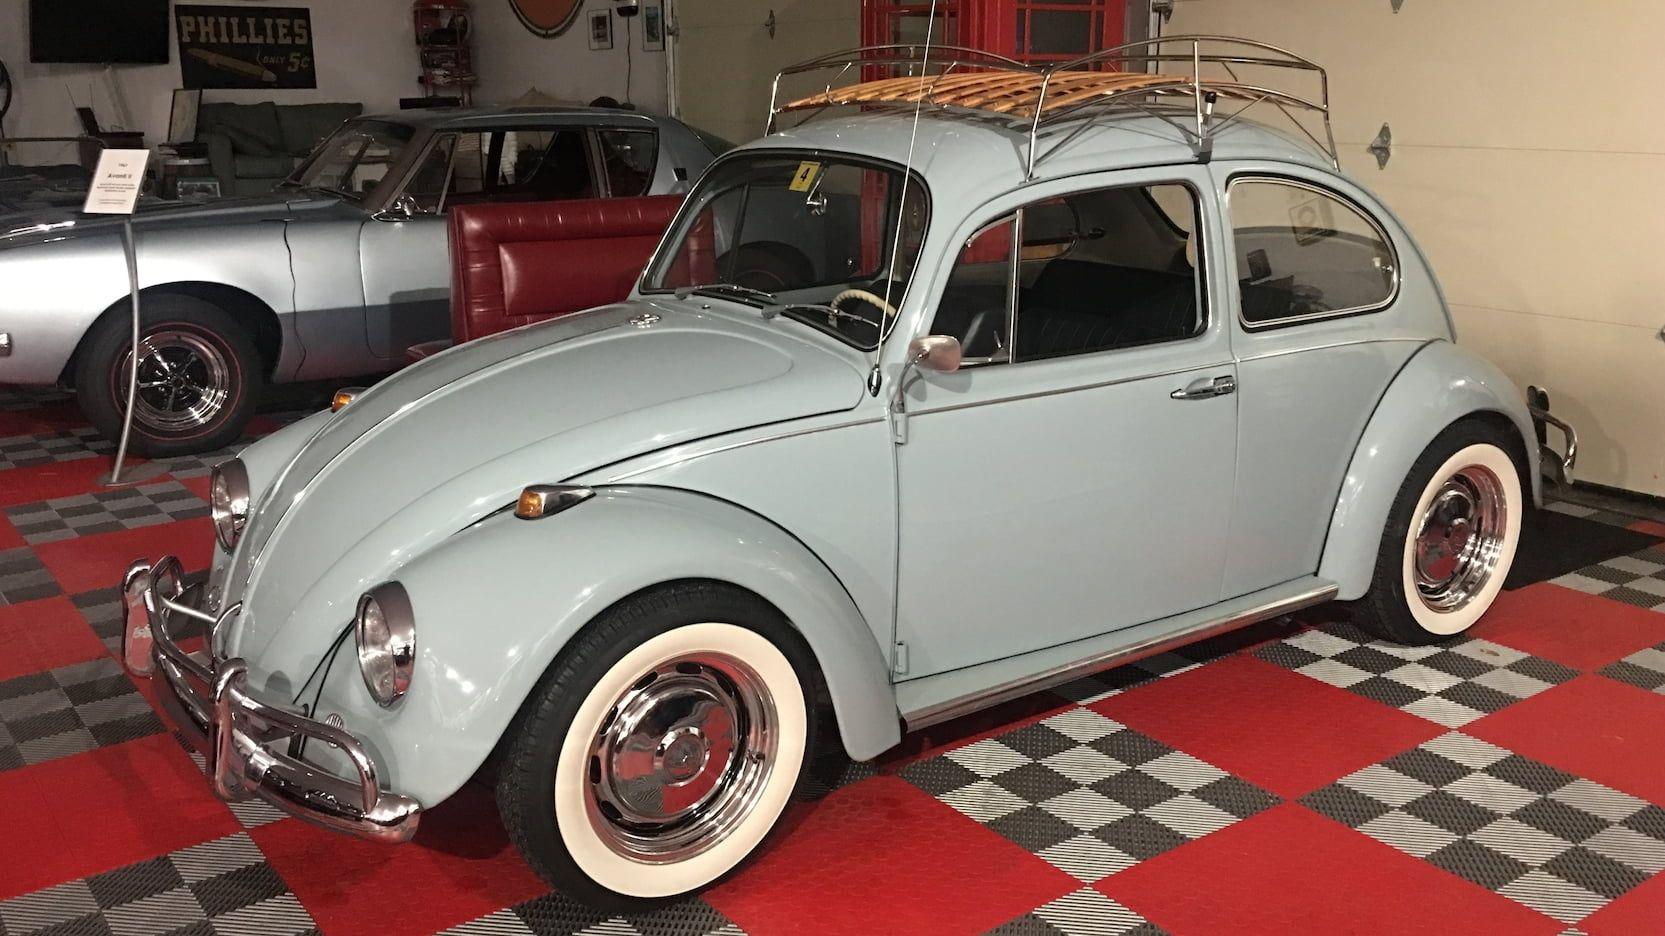 1967 Volkswagen Beetle Presented As Lot T47 At Indianapolis In Volkswagen Beetle Volkswagen Mecum Auction